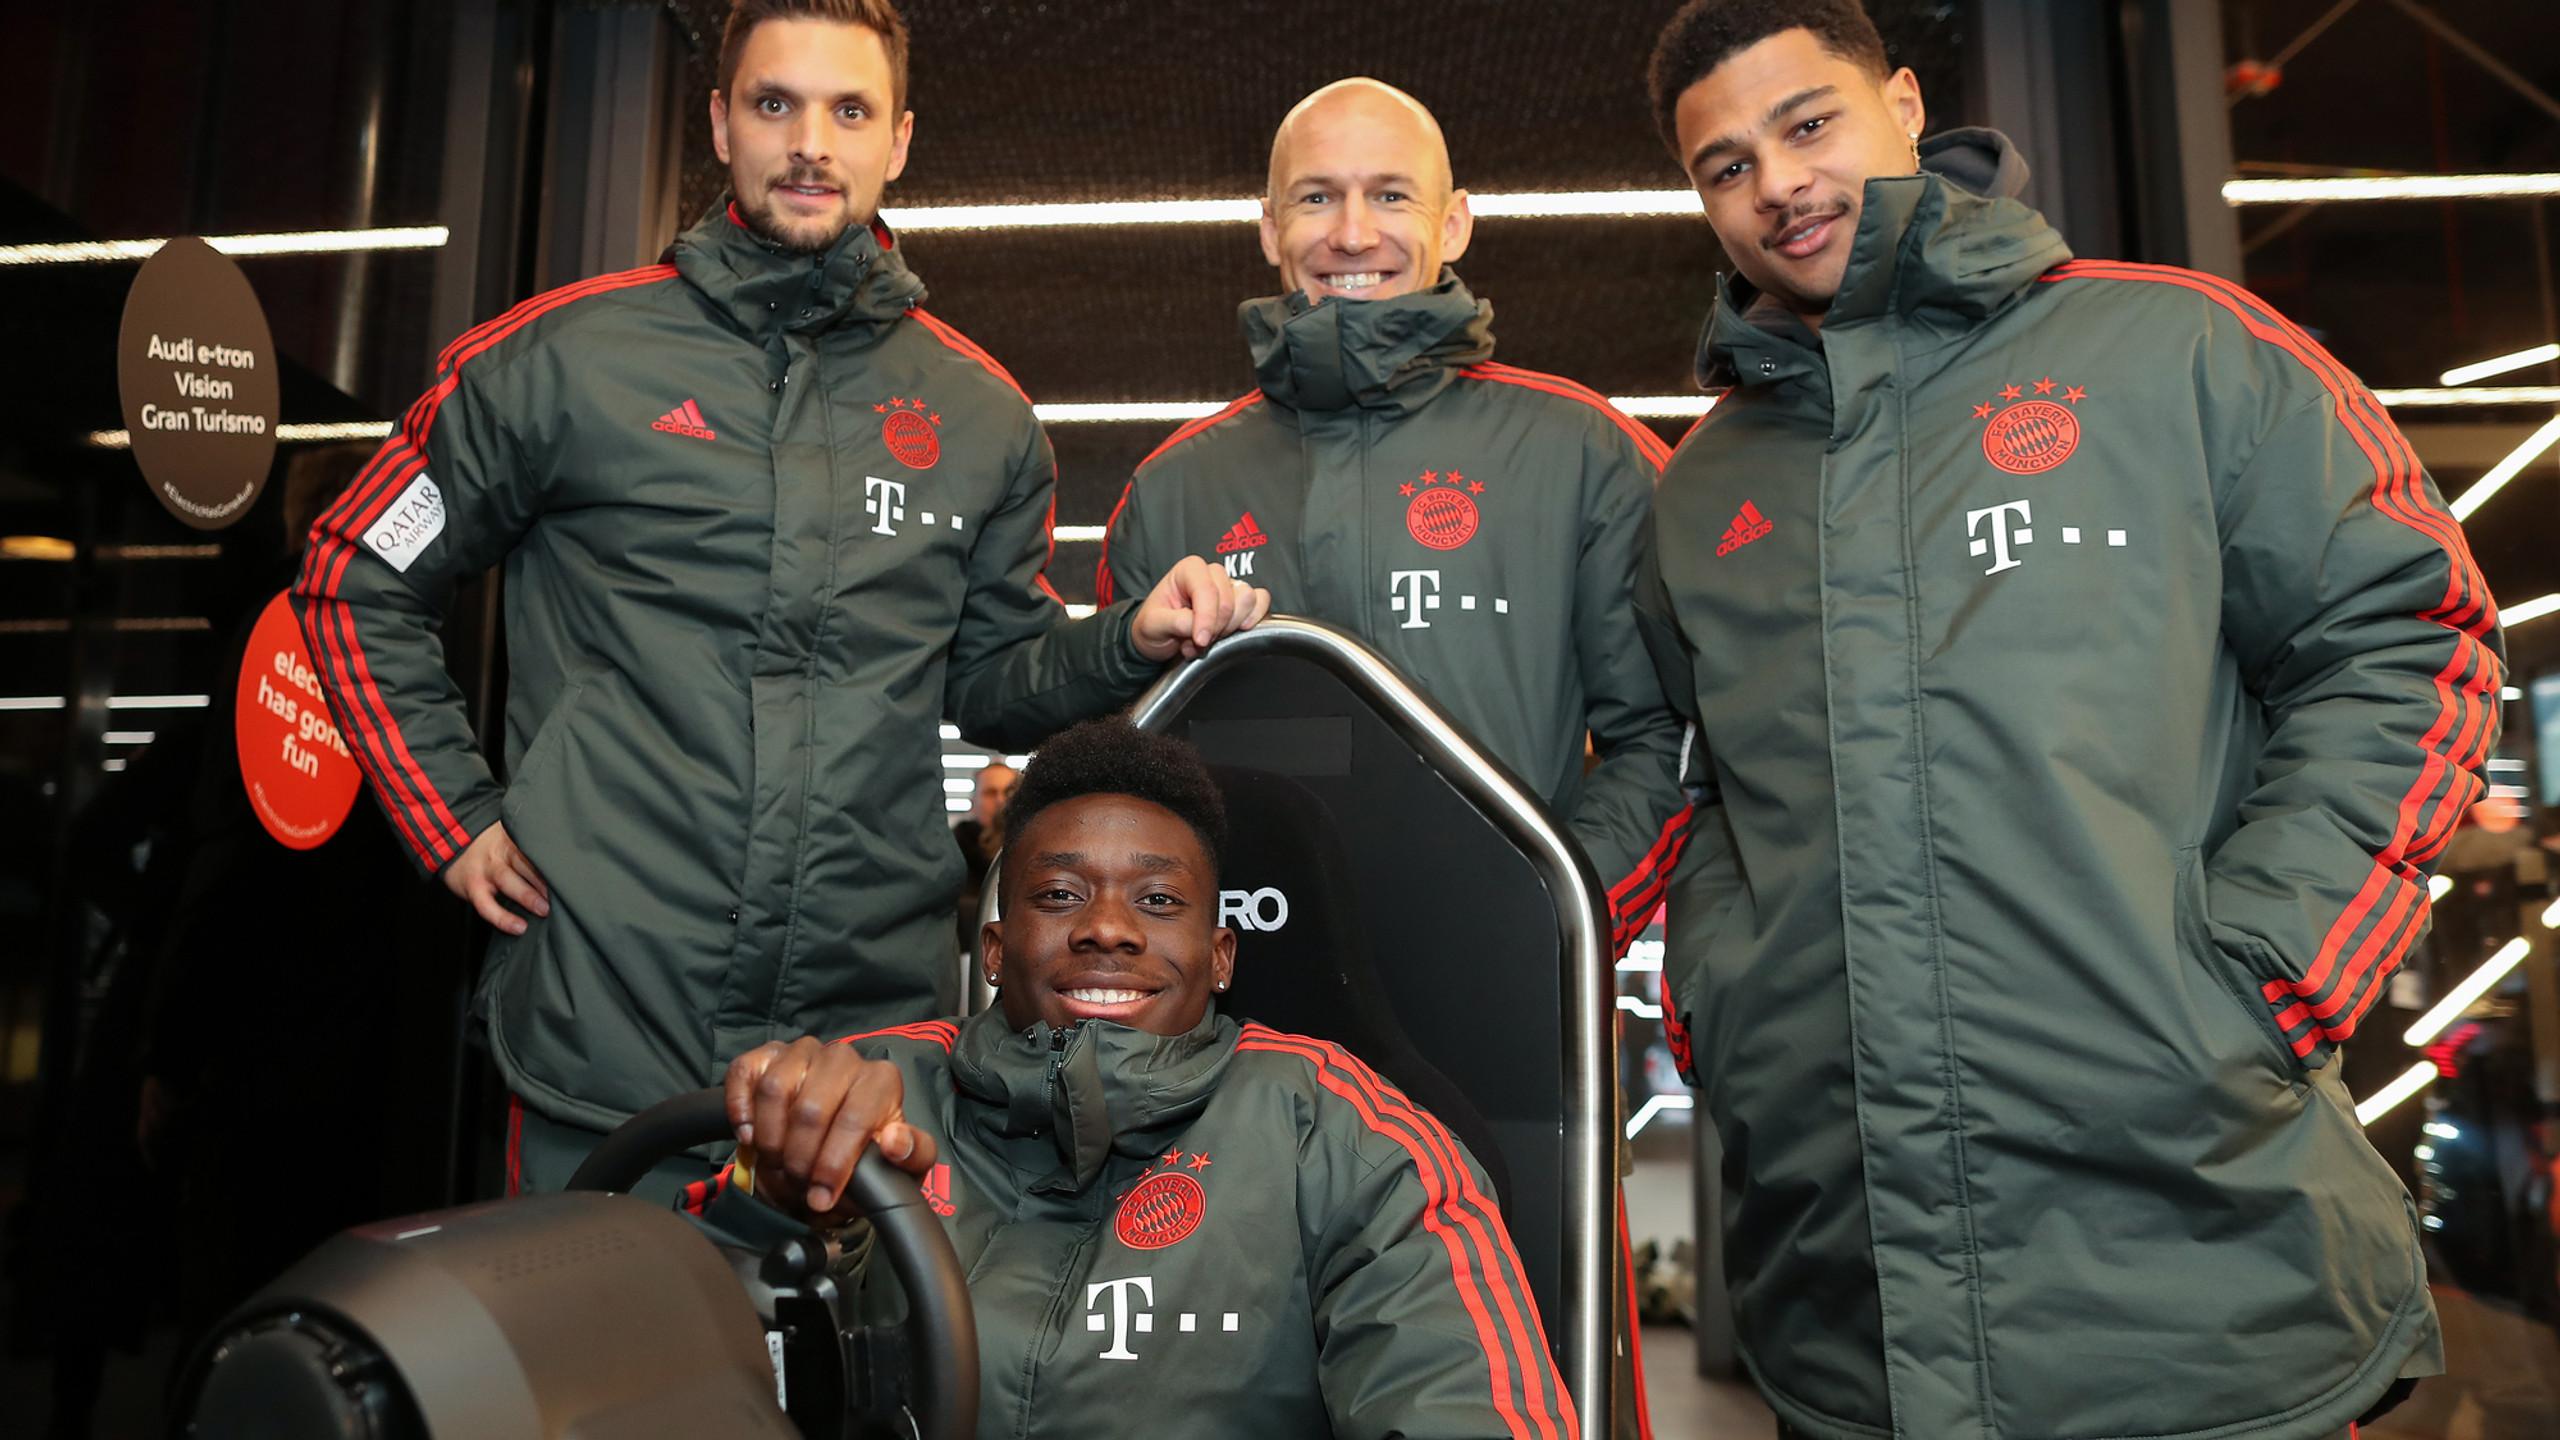 FC Meets Bayern